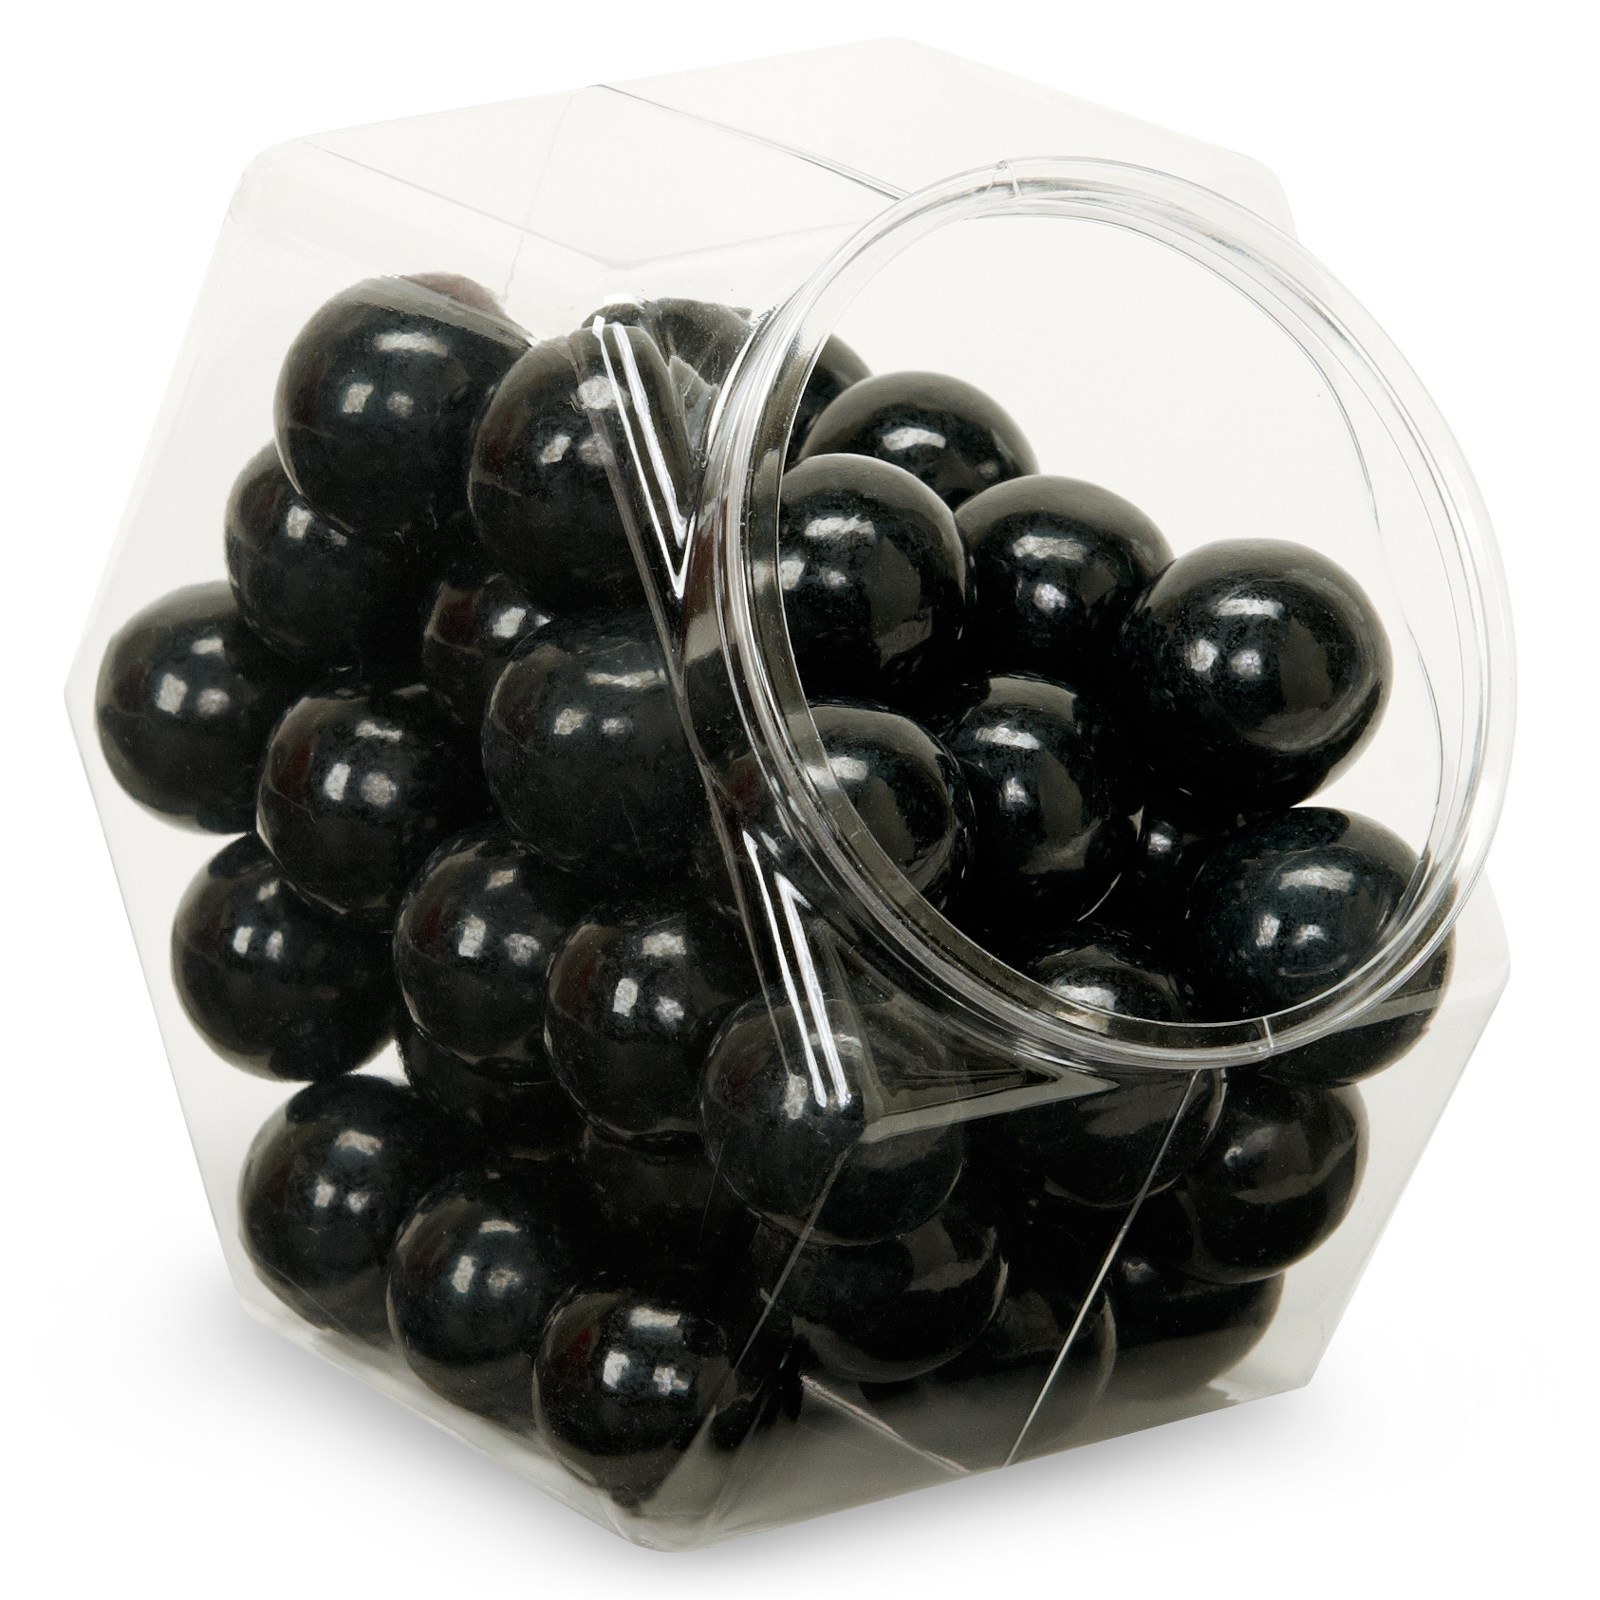 Image of Black Gumballs